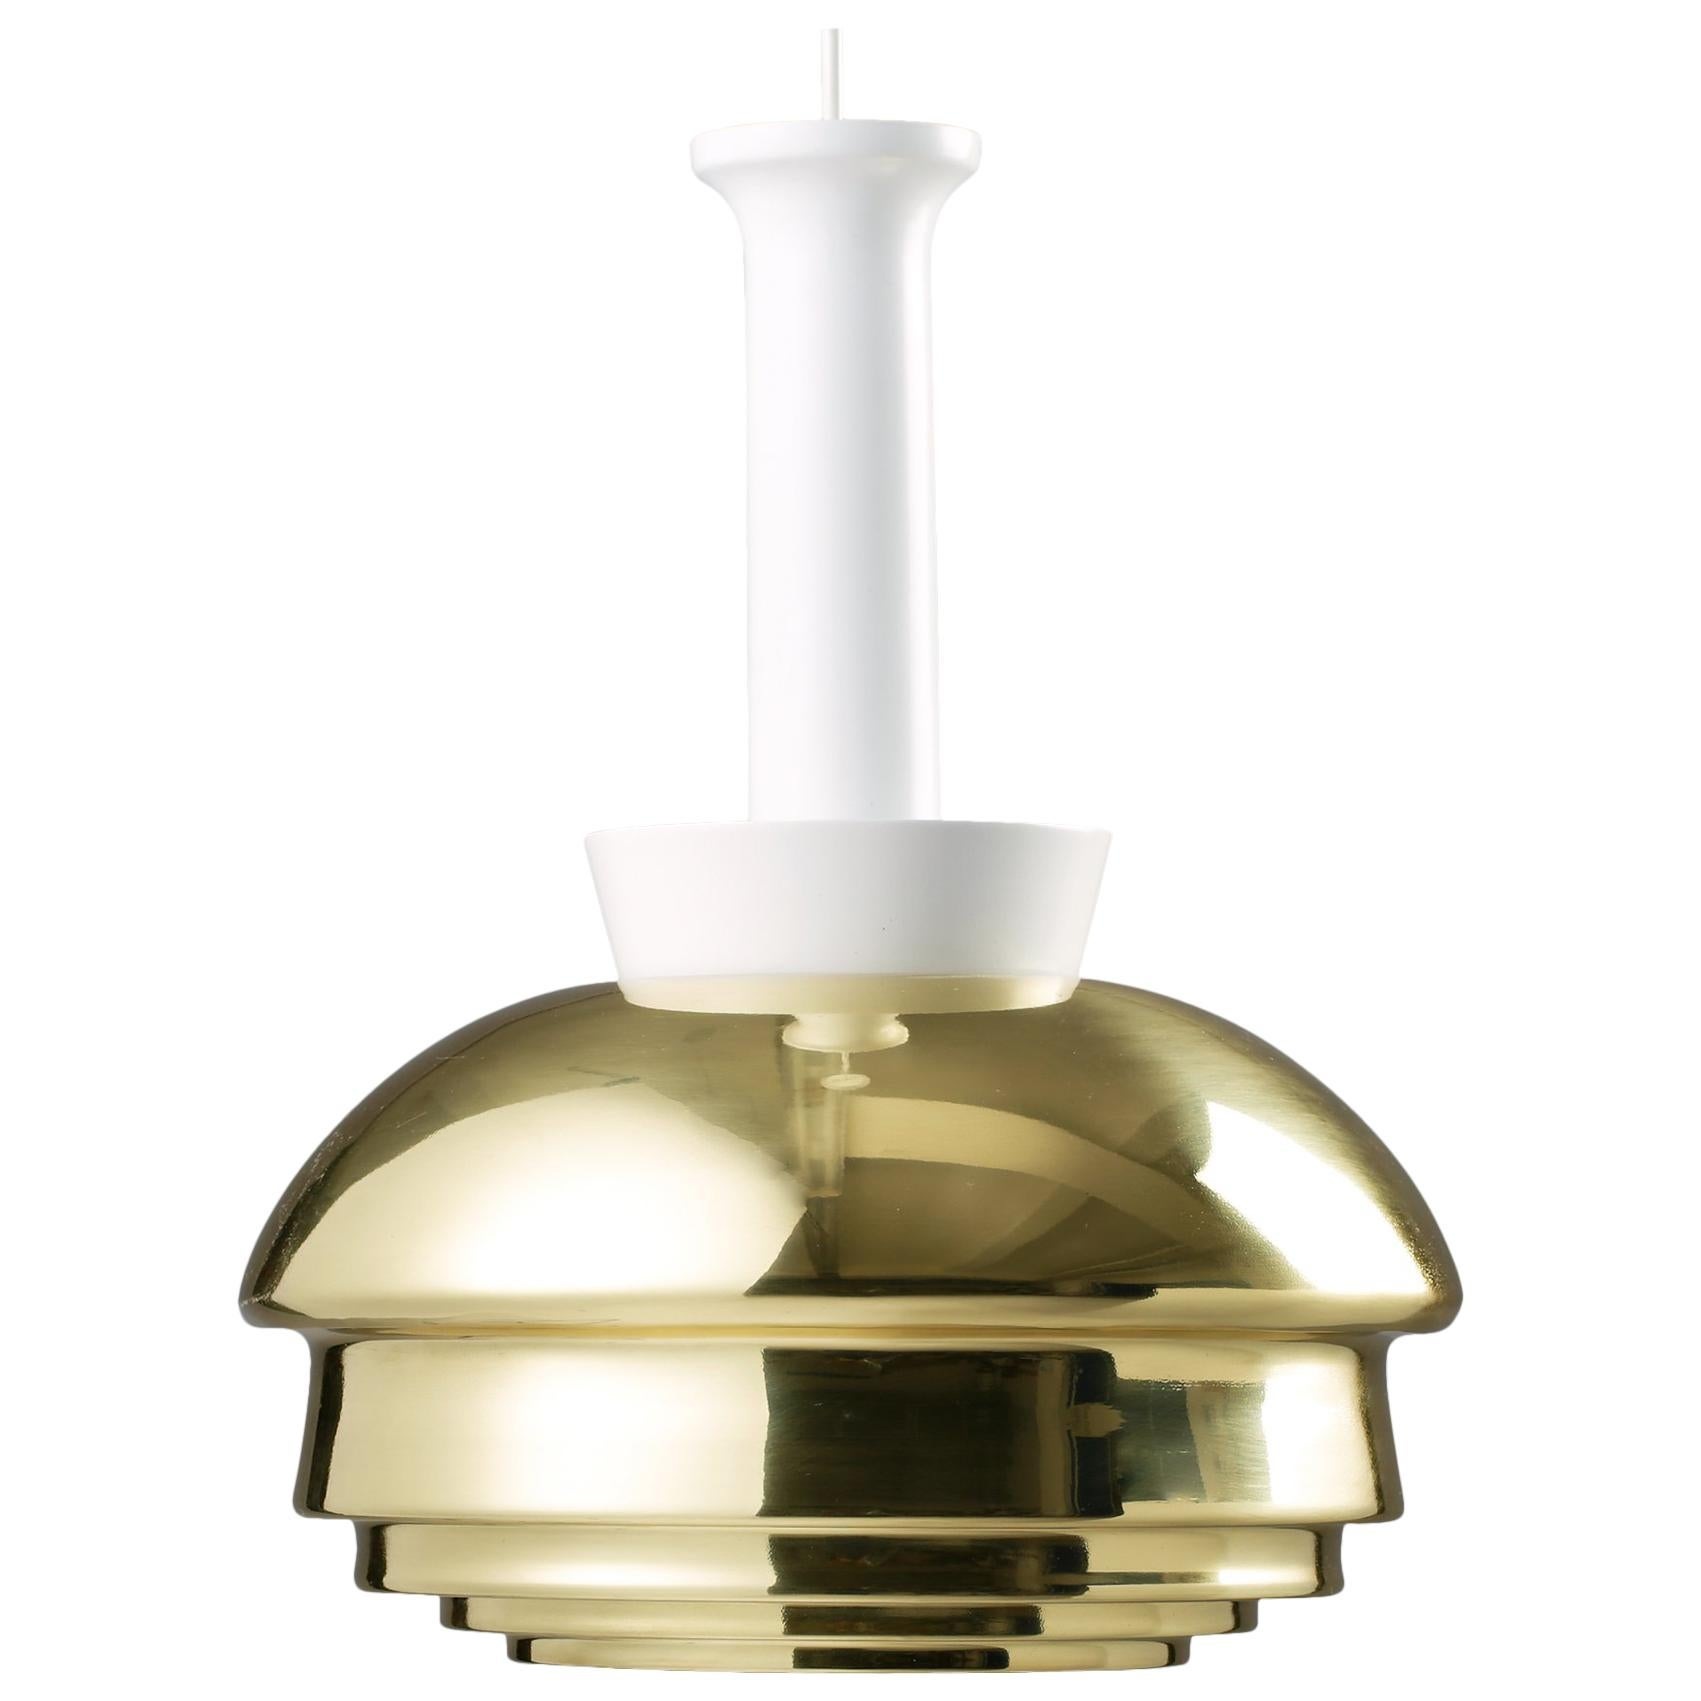 Ceiling Light Model A 335 Designed by Alvar Aalto for Valaisinpaja Oy, Finland